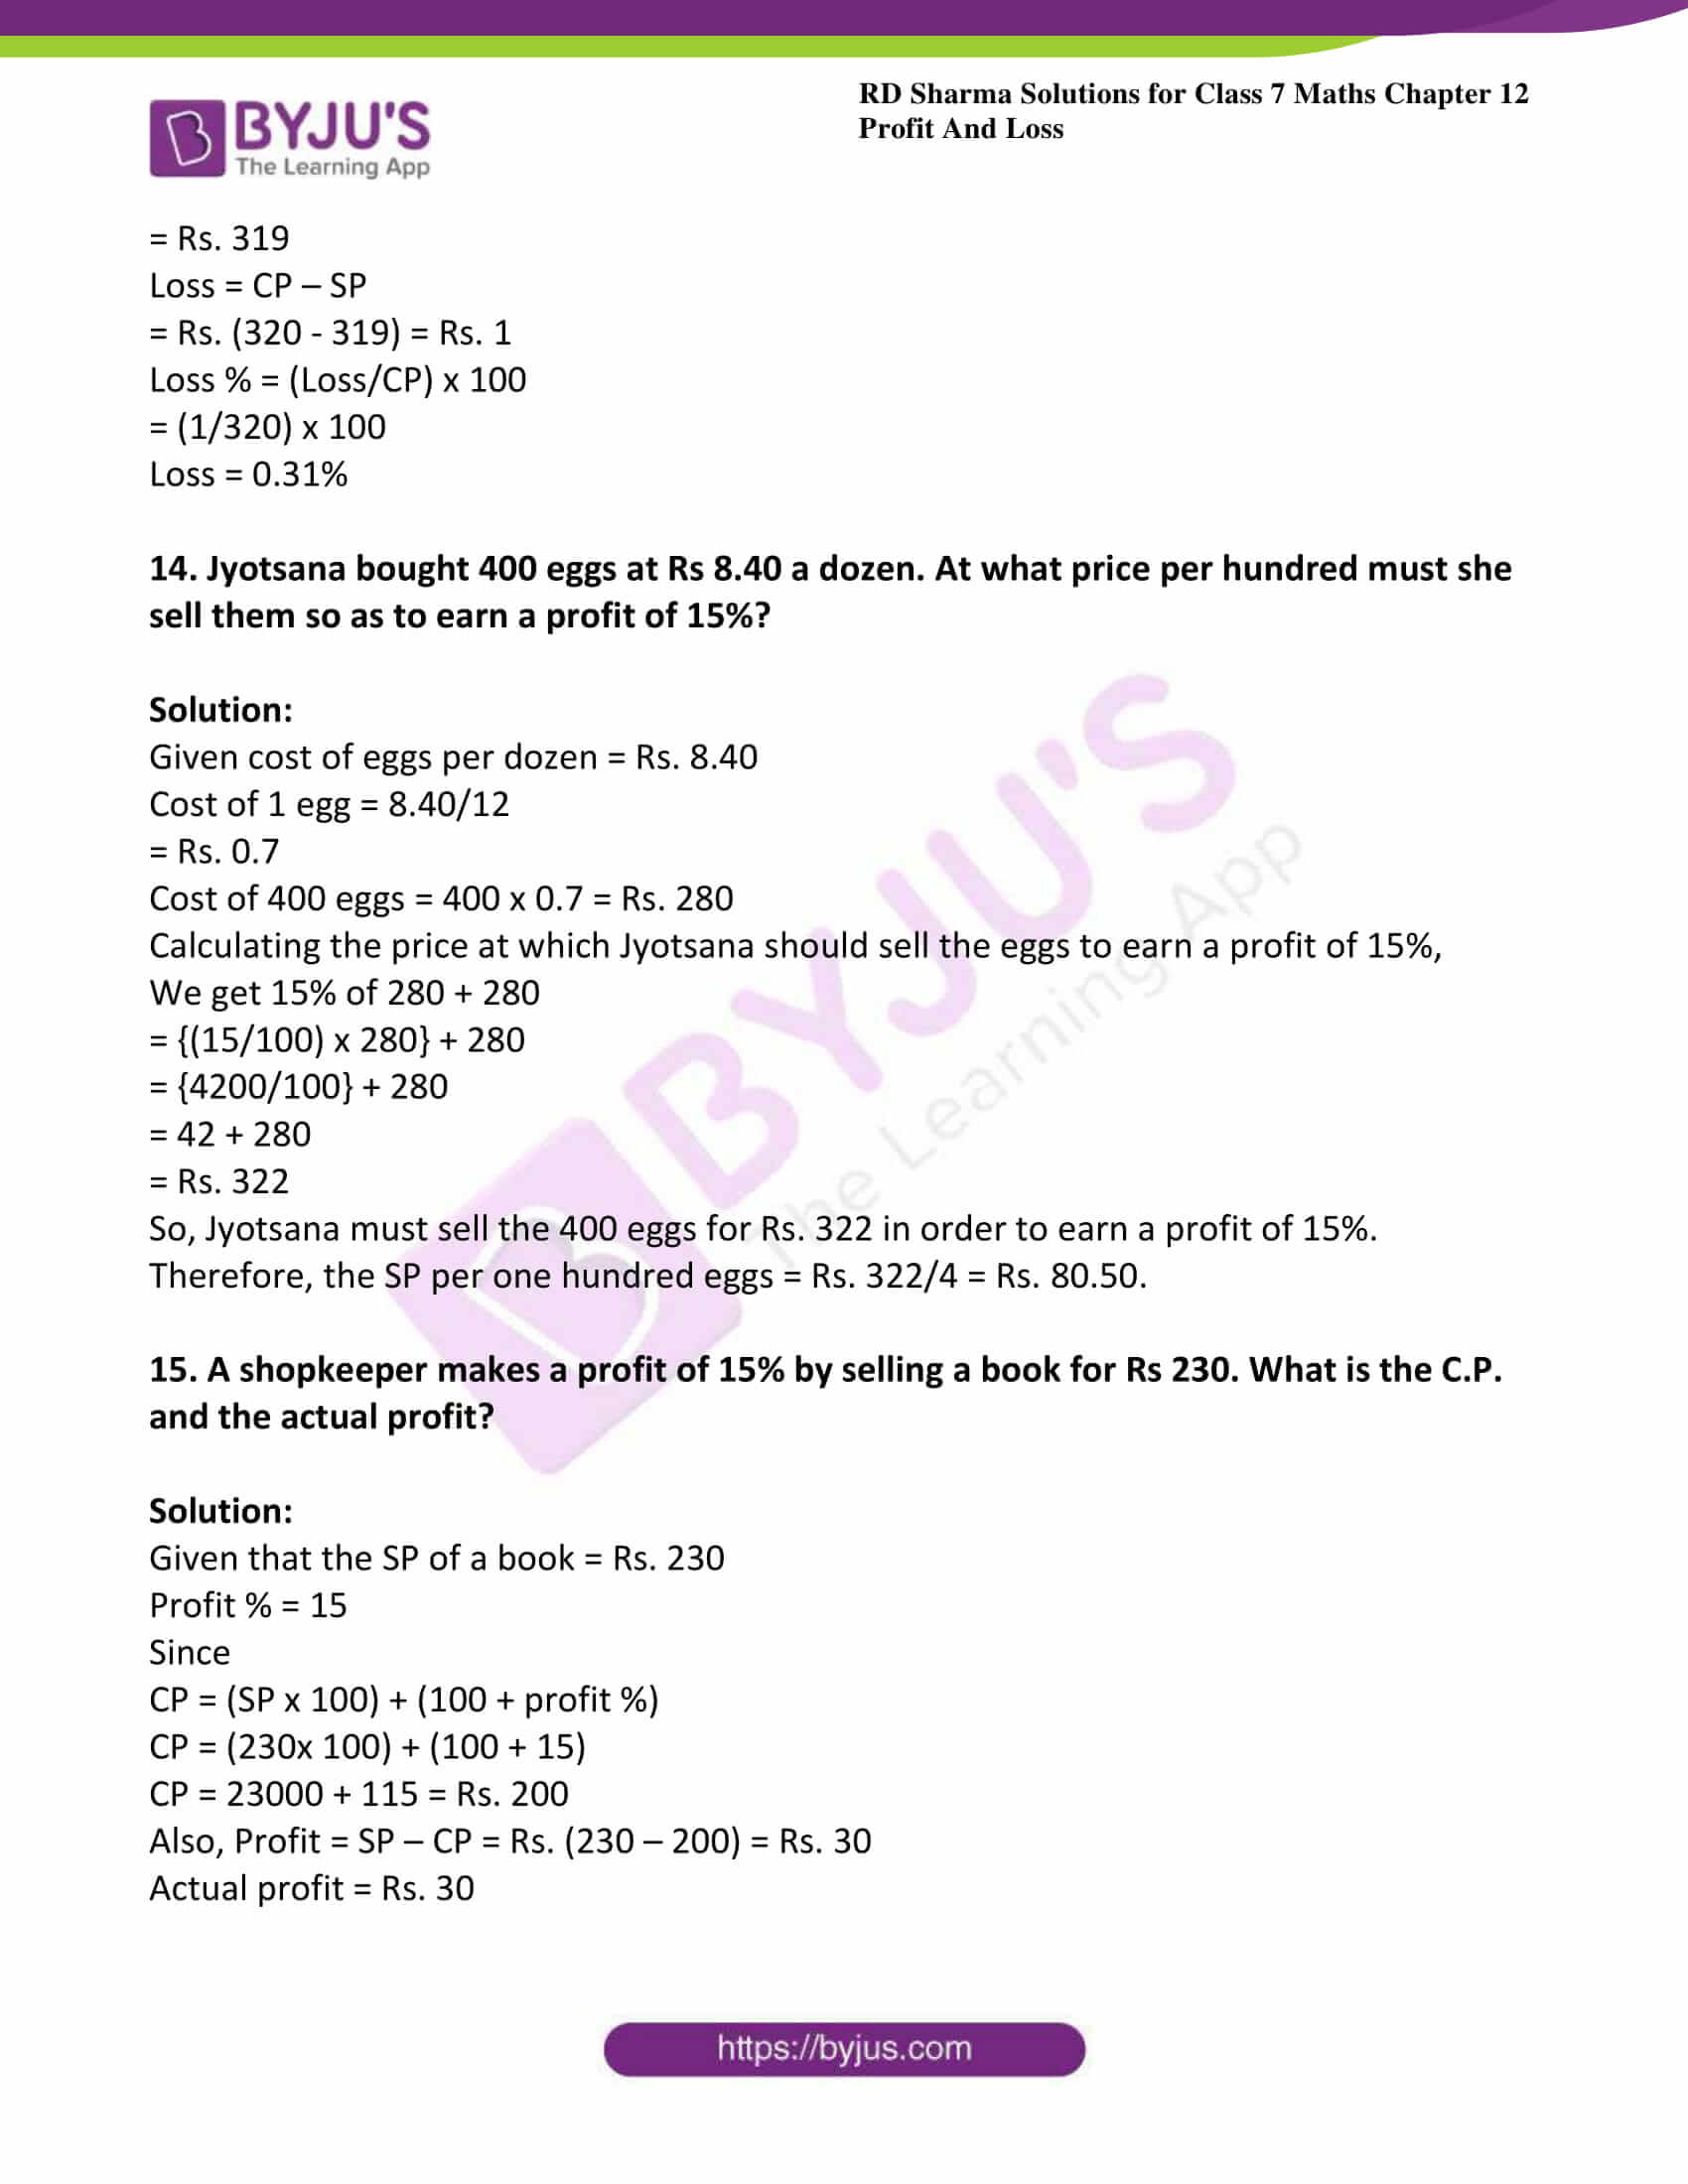 rd sharma class 7 maths solution ch 12